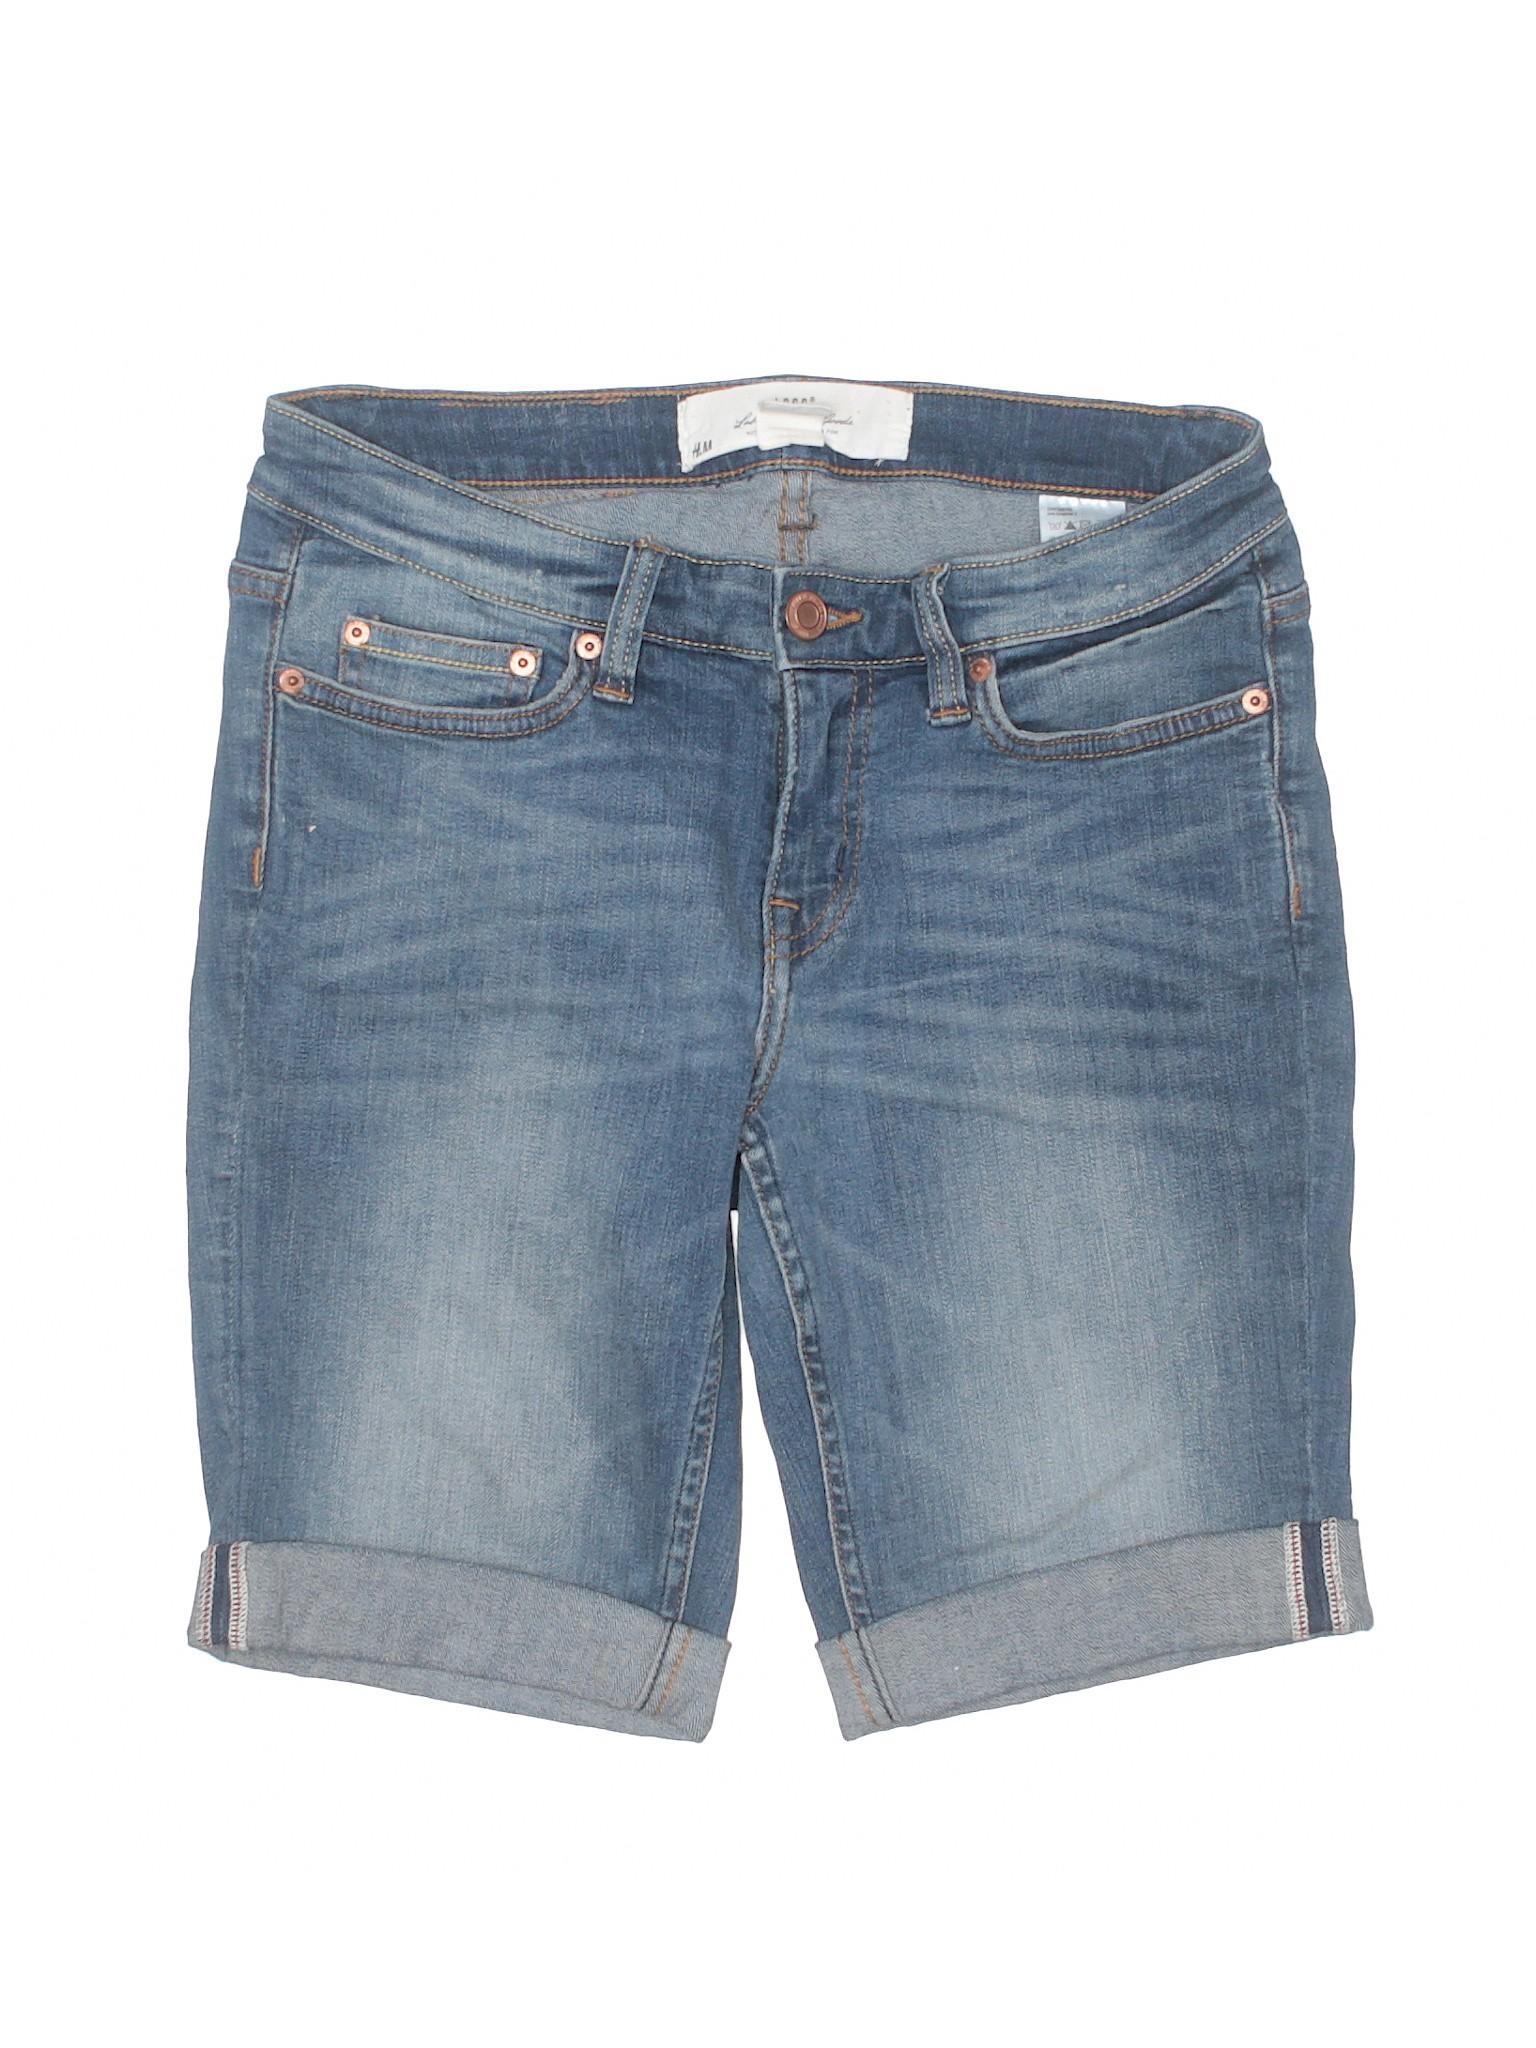 leisure Shorts H Boutique Denim amp;M xBnY04HqA